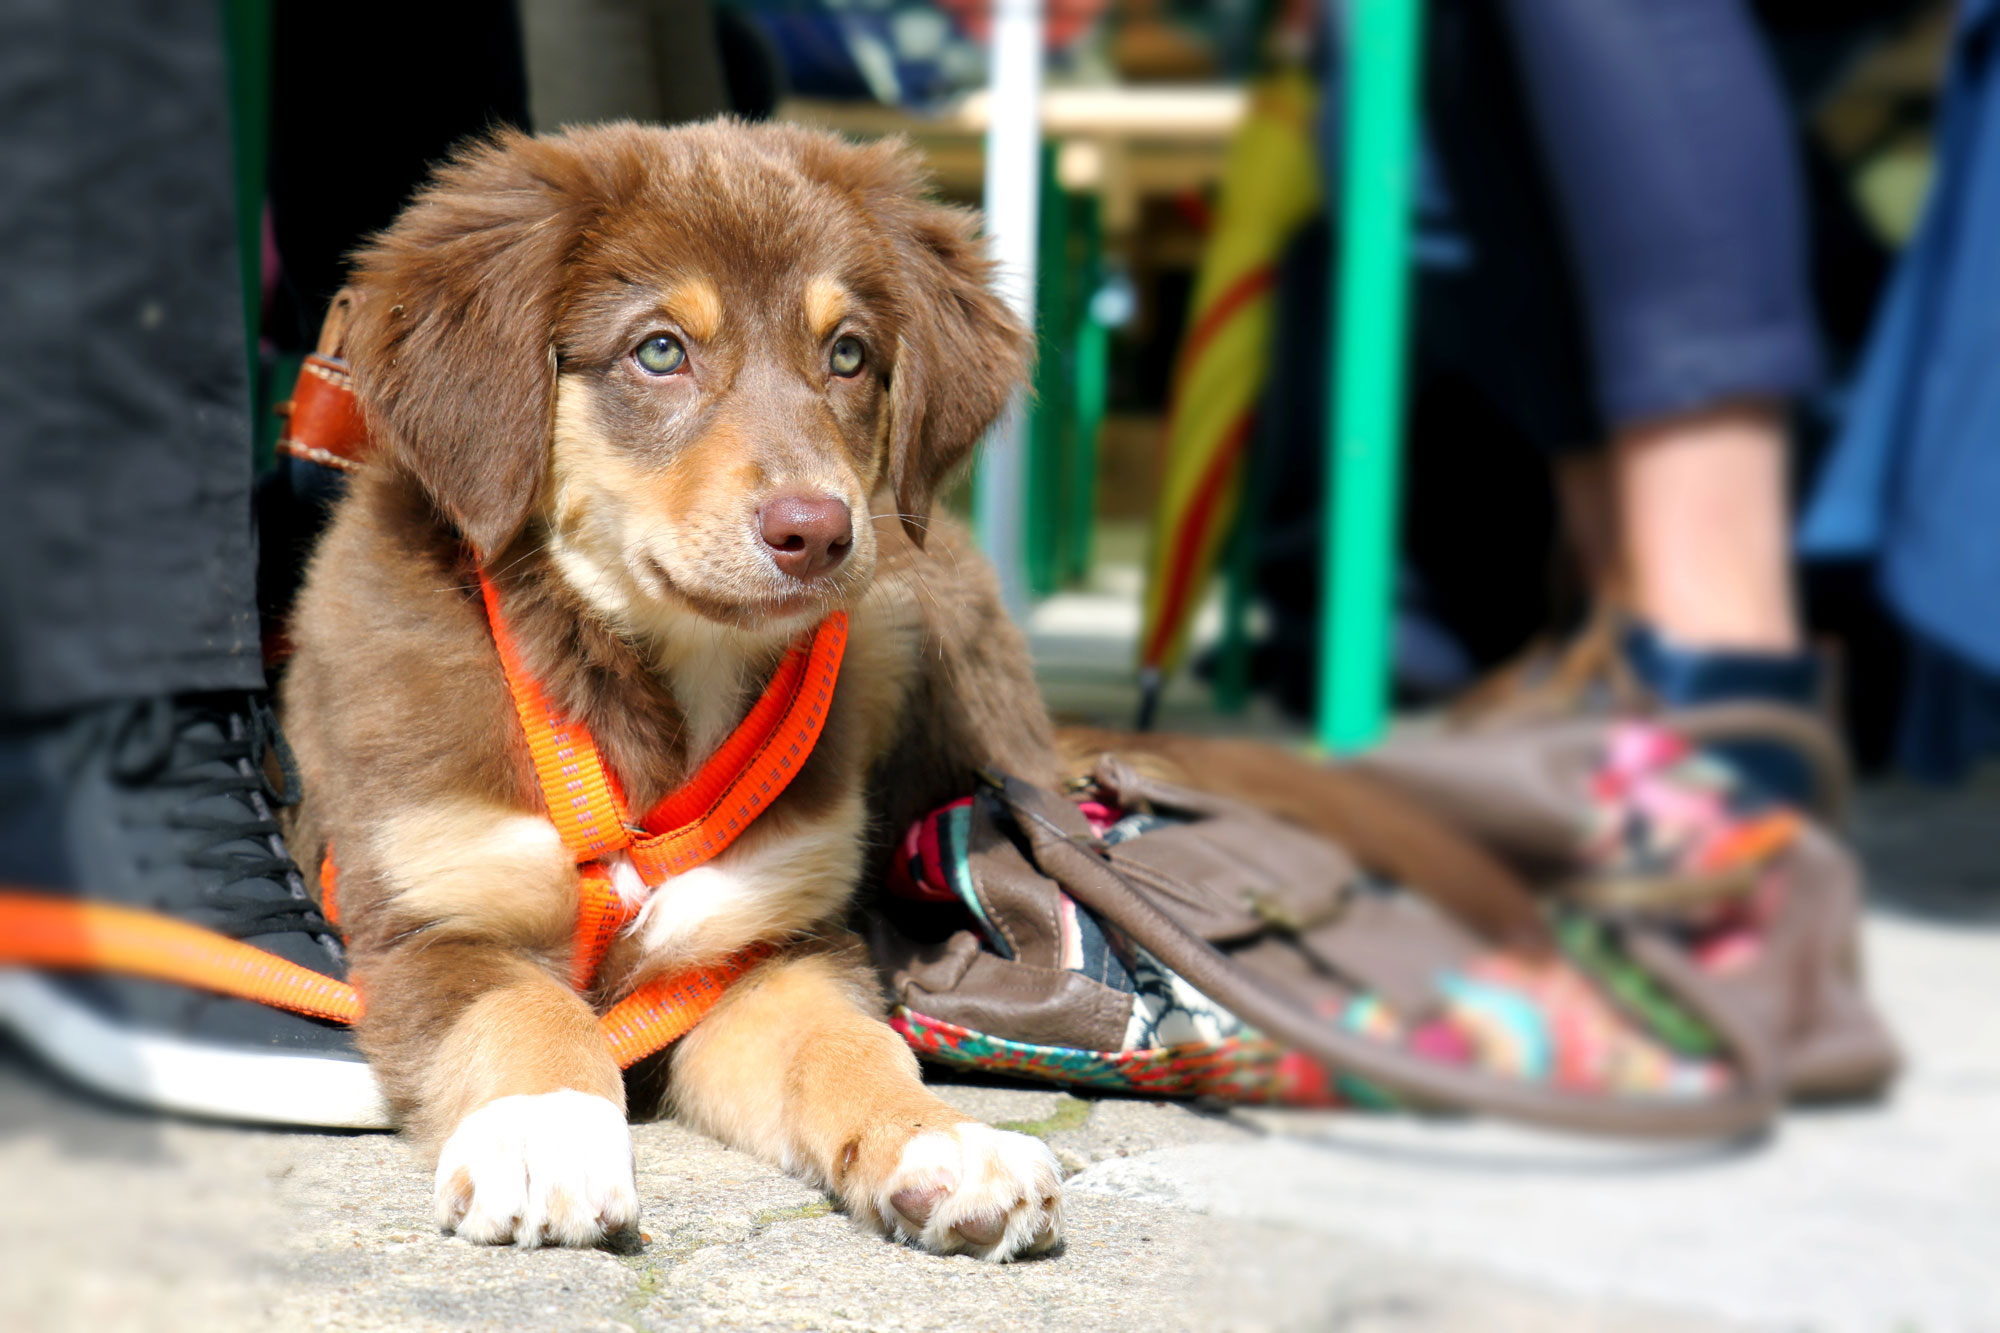 cintadogs - Hundeschule in Melle